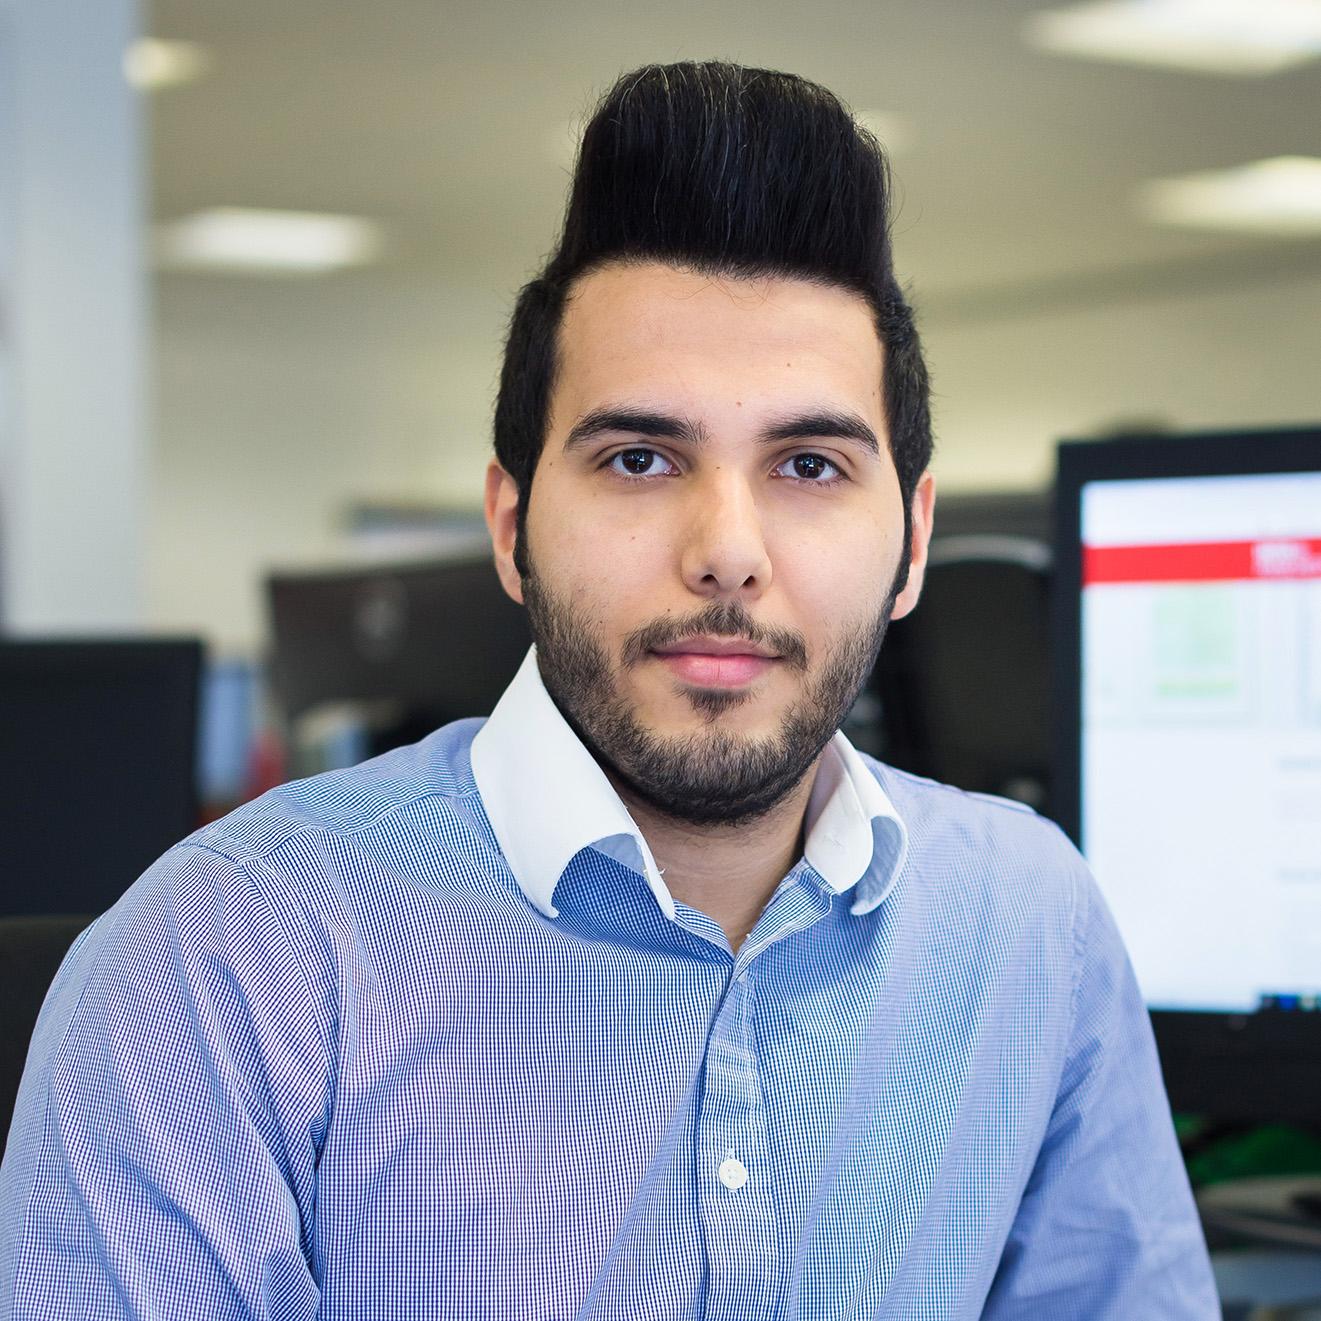 Ahmed Al-Awadhi